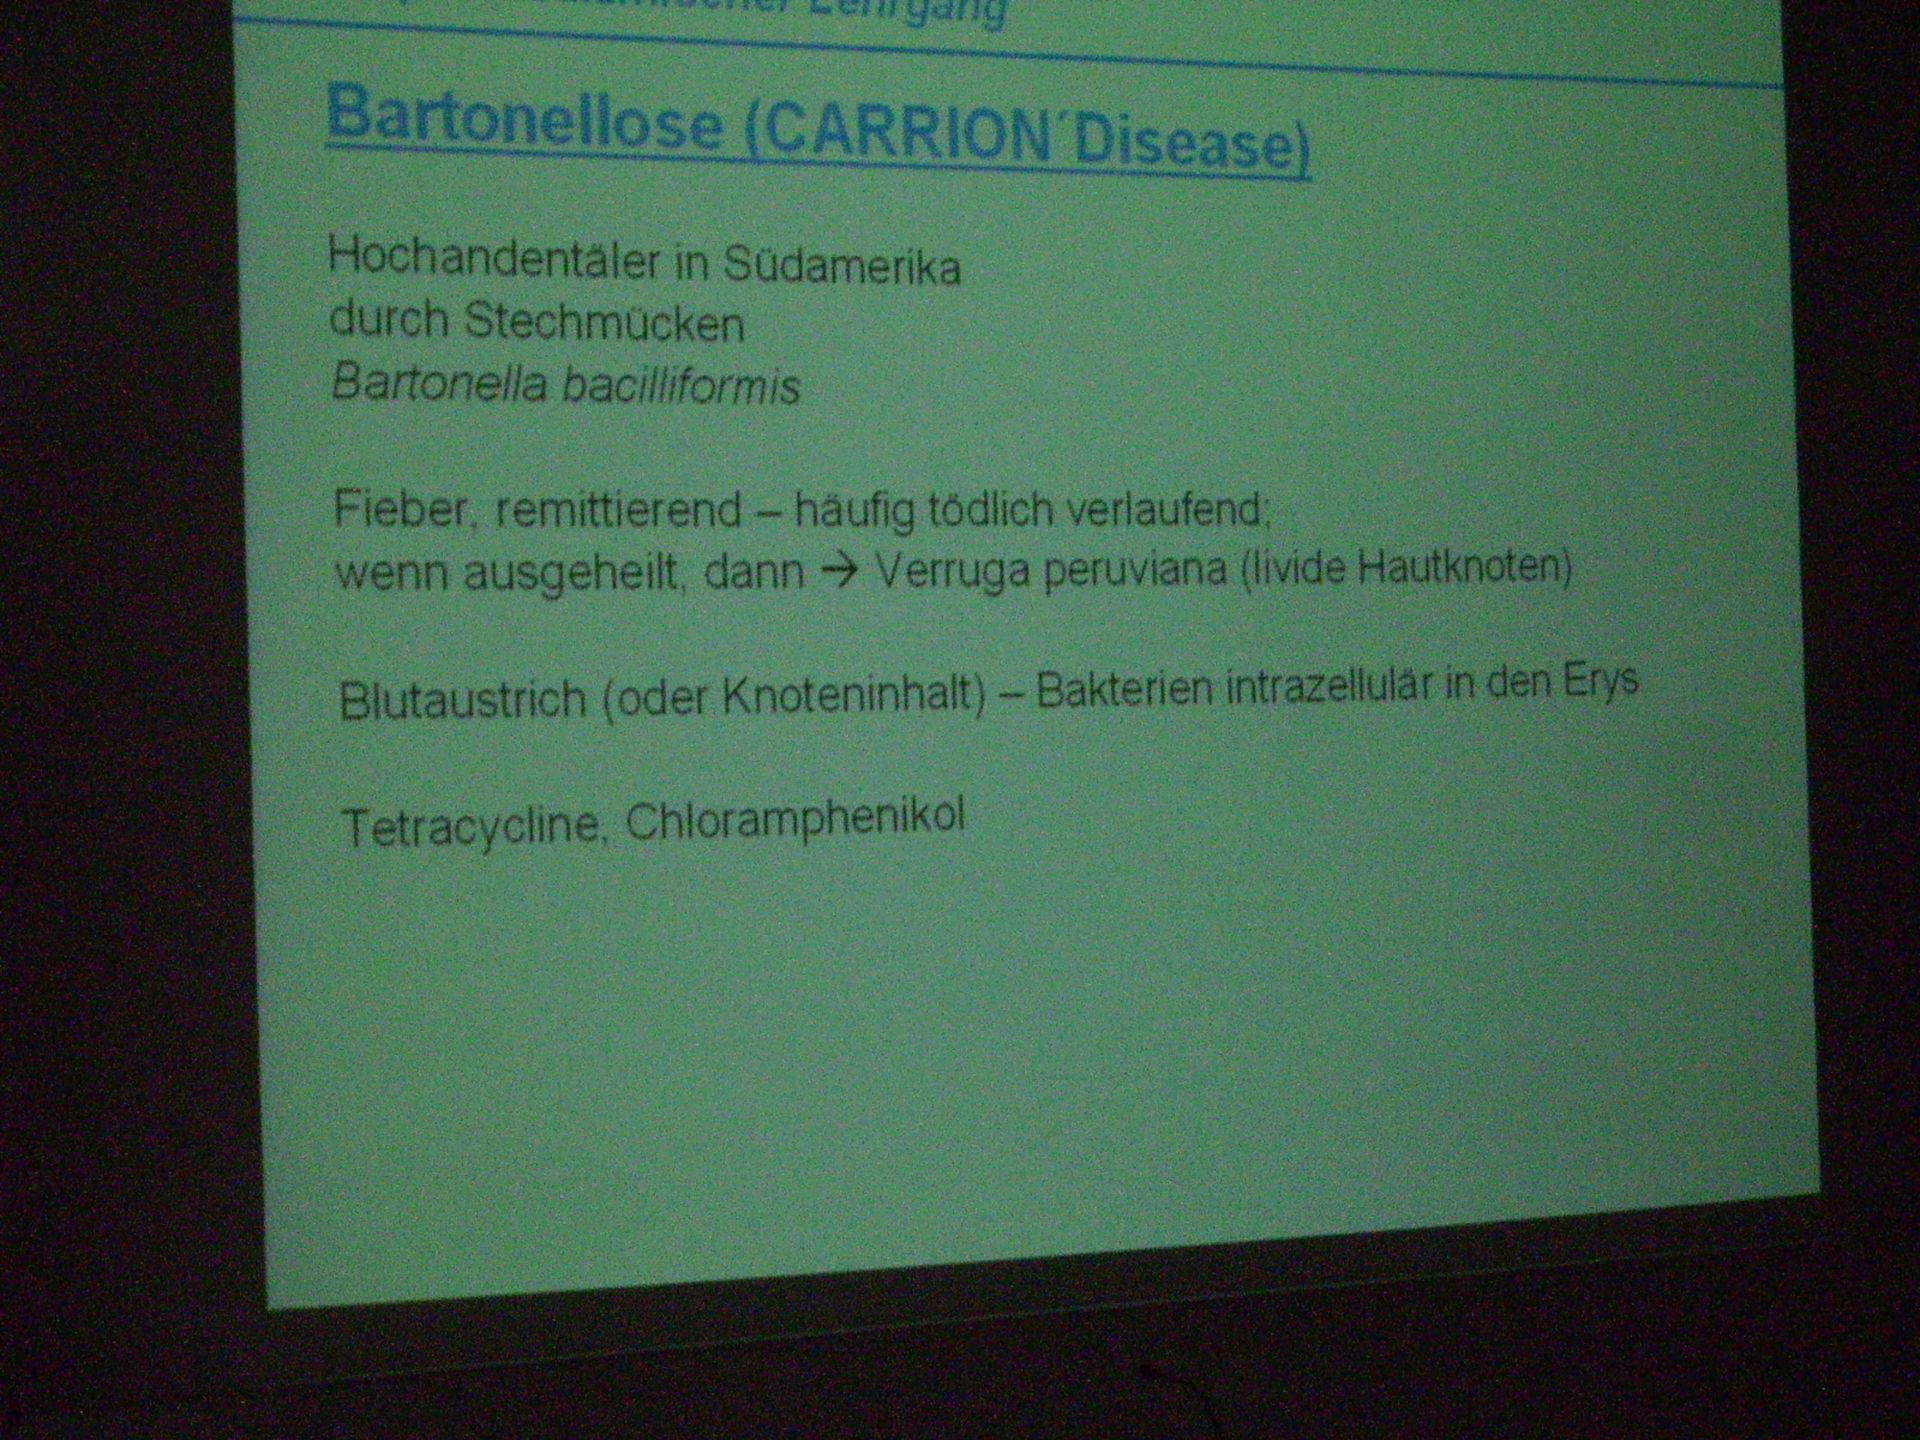 Definition - bartonellosis (Carrion Disease)